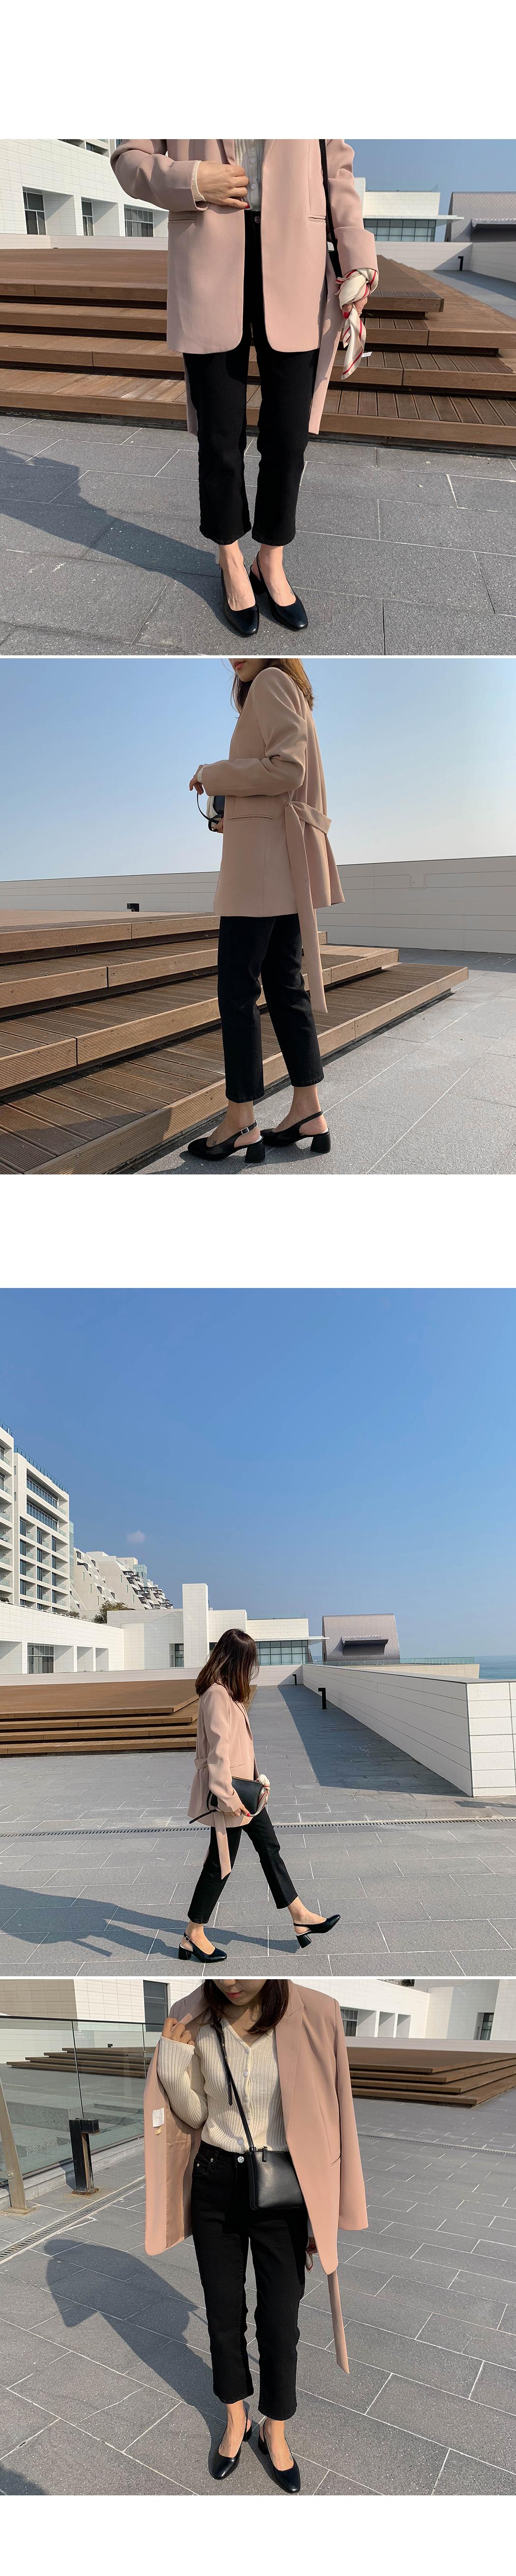 Megan-Slingback Shoes